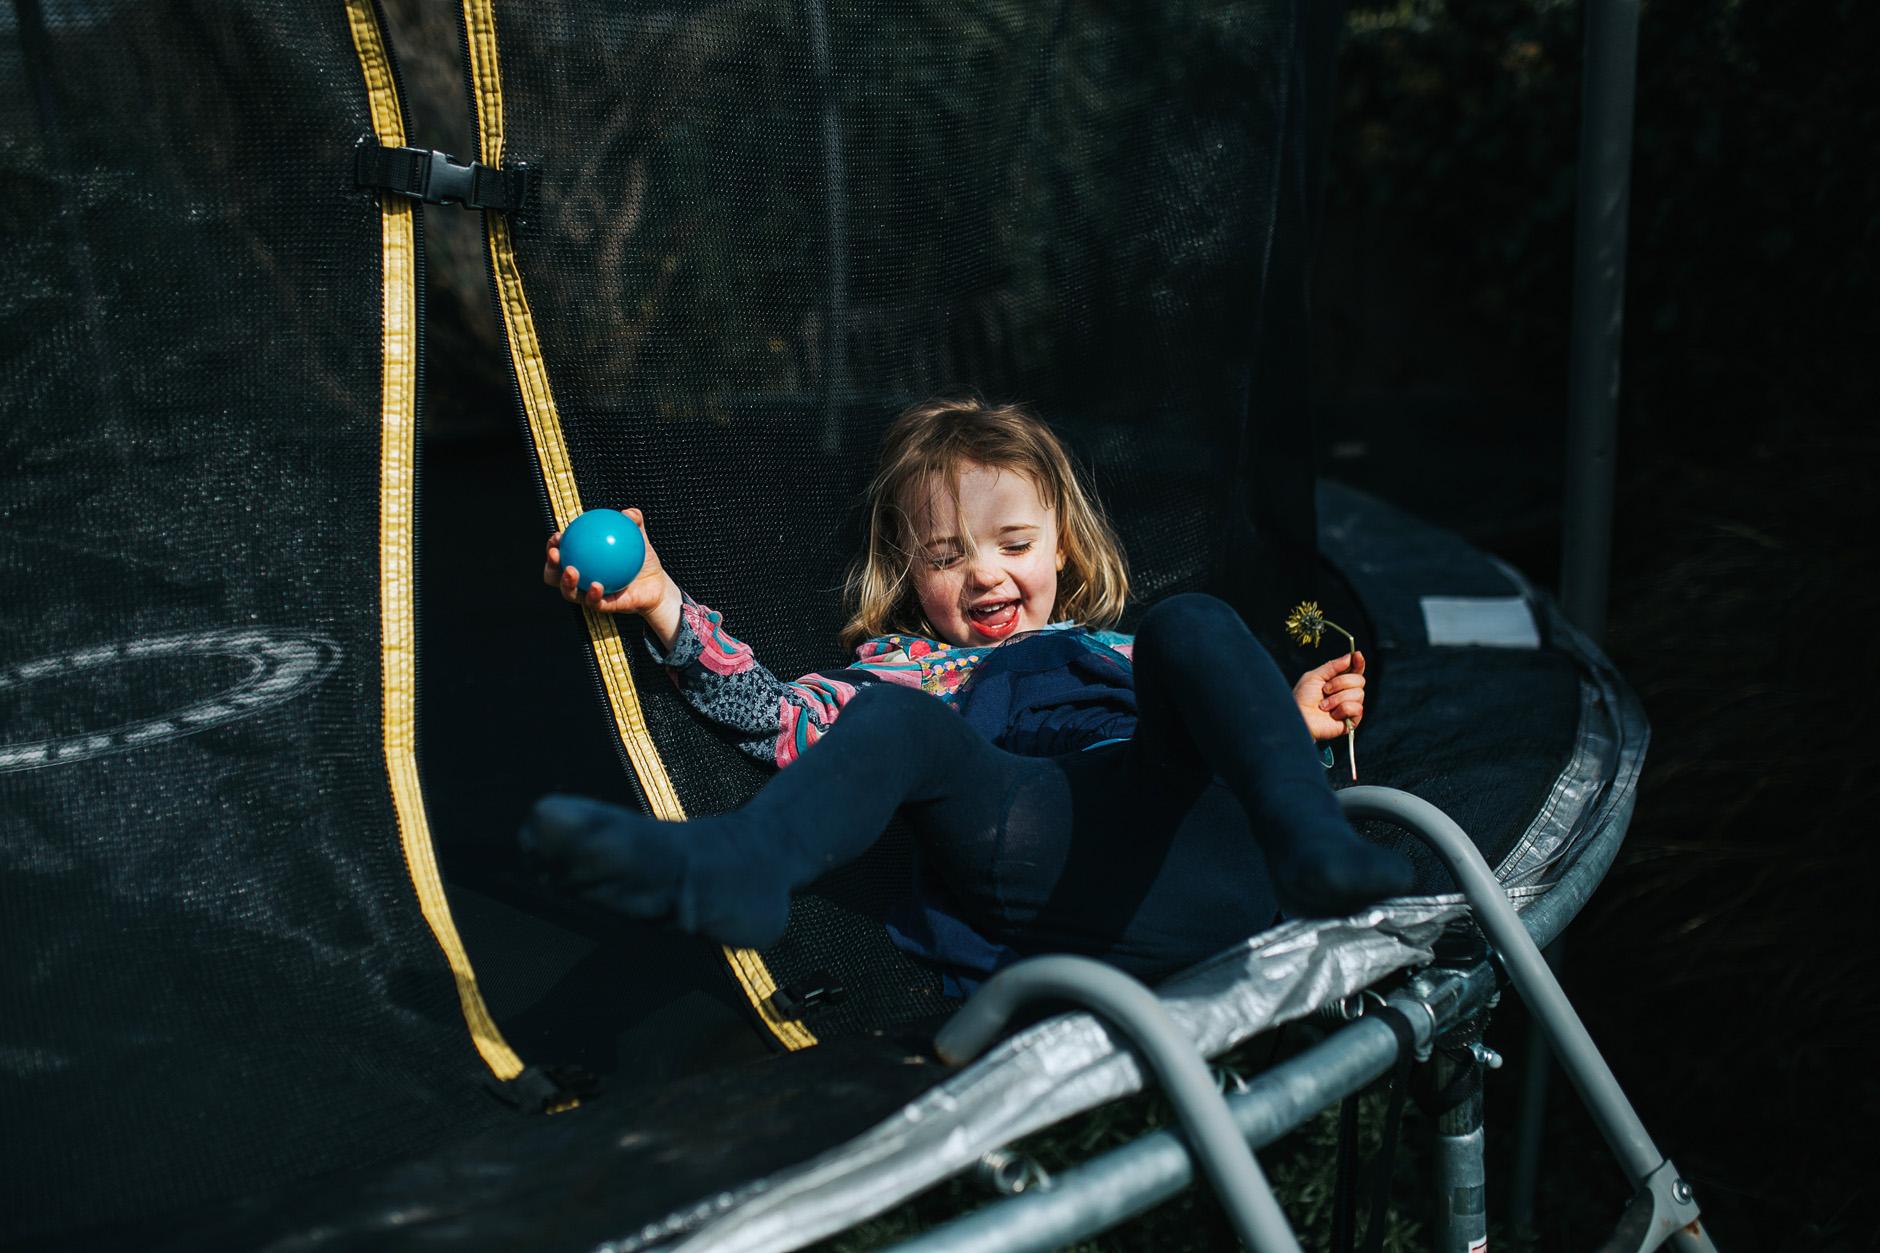 candid-natural-children-family-photographer-dublin-0054.jpg